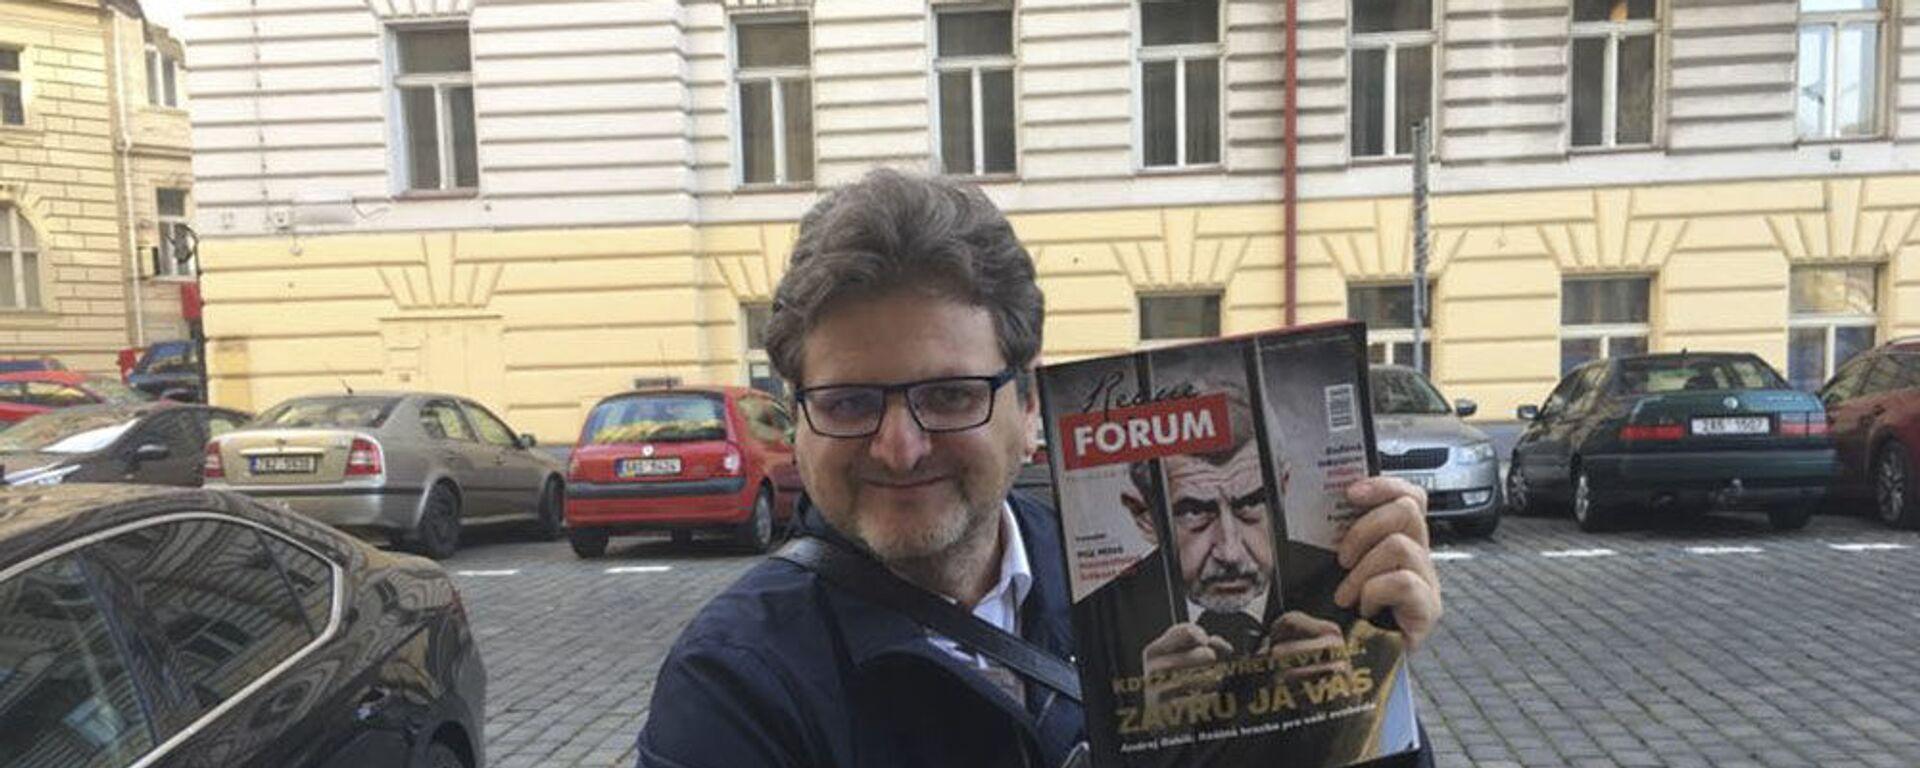 Šéfredaktor portálu Forum24 Pavel Šafr - Sputnik Česká republika, 1920, 03.06.2021